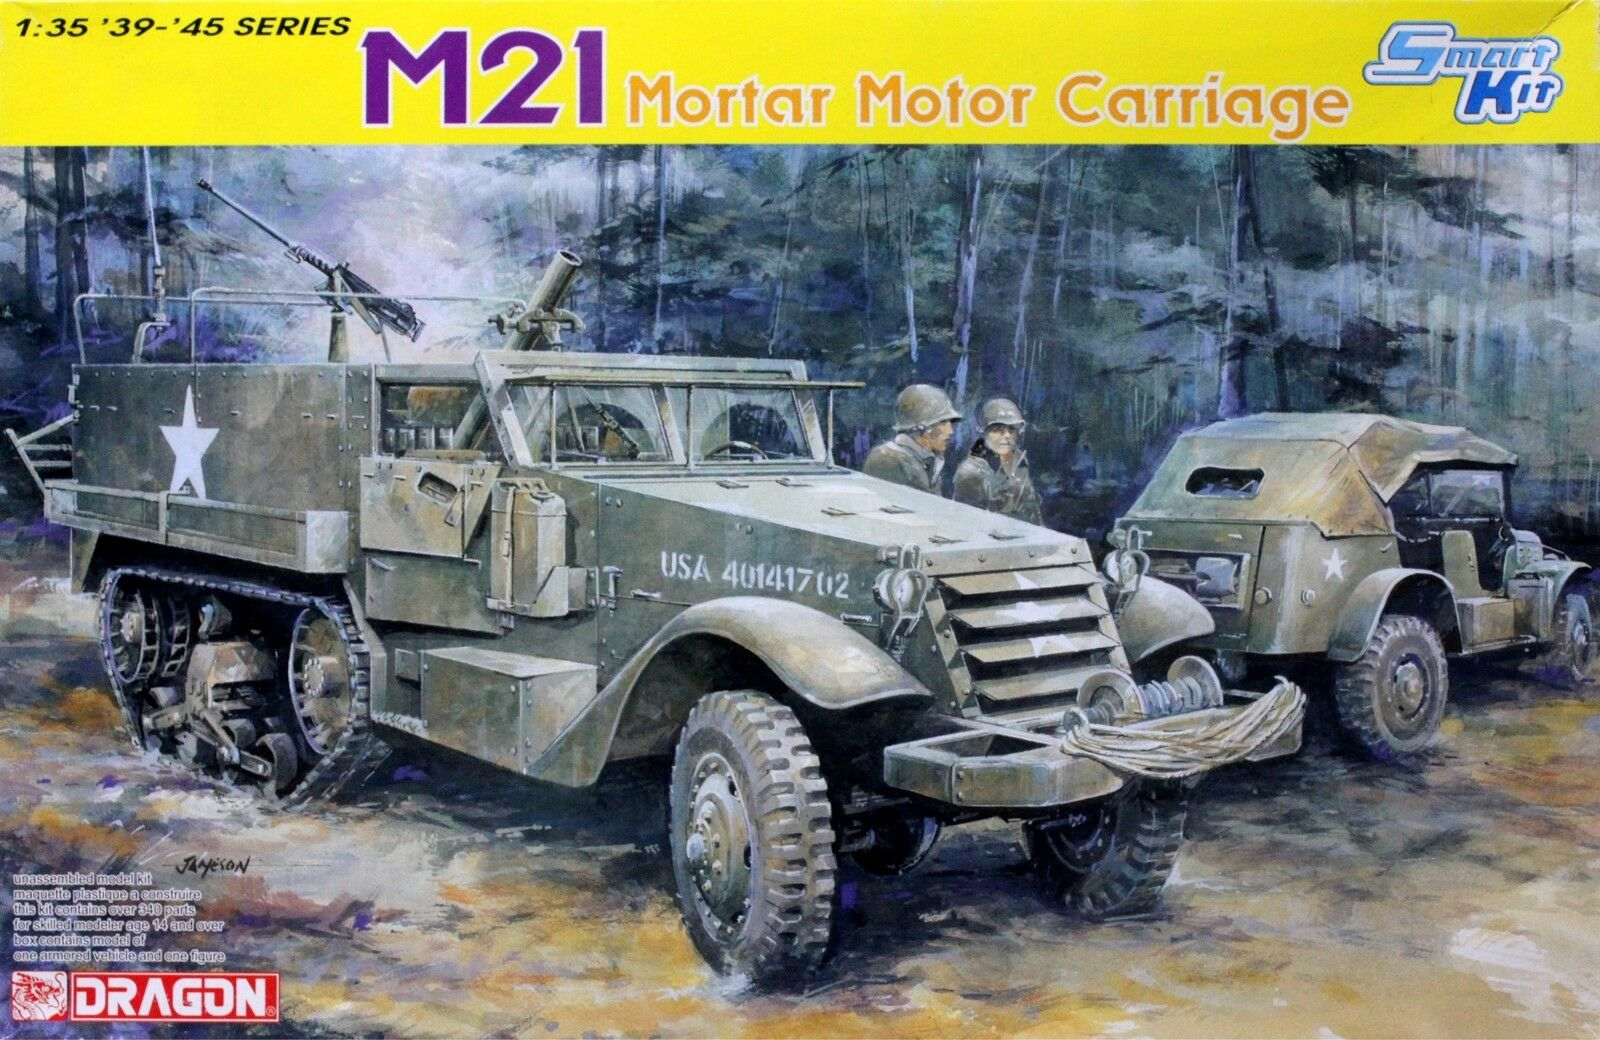 Dragon Models 1/35 M21 Mortar Motor Carriage Smart Kit 6362